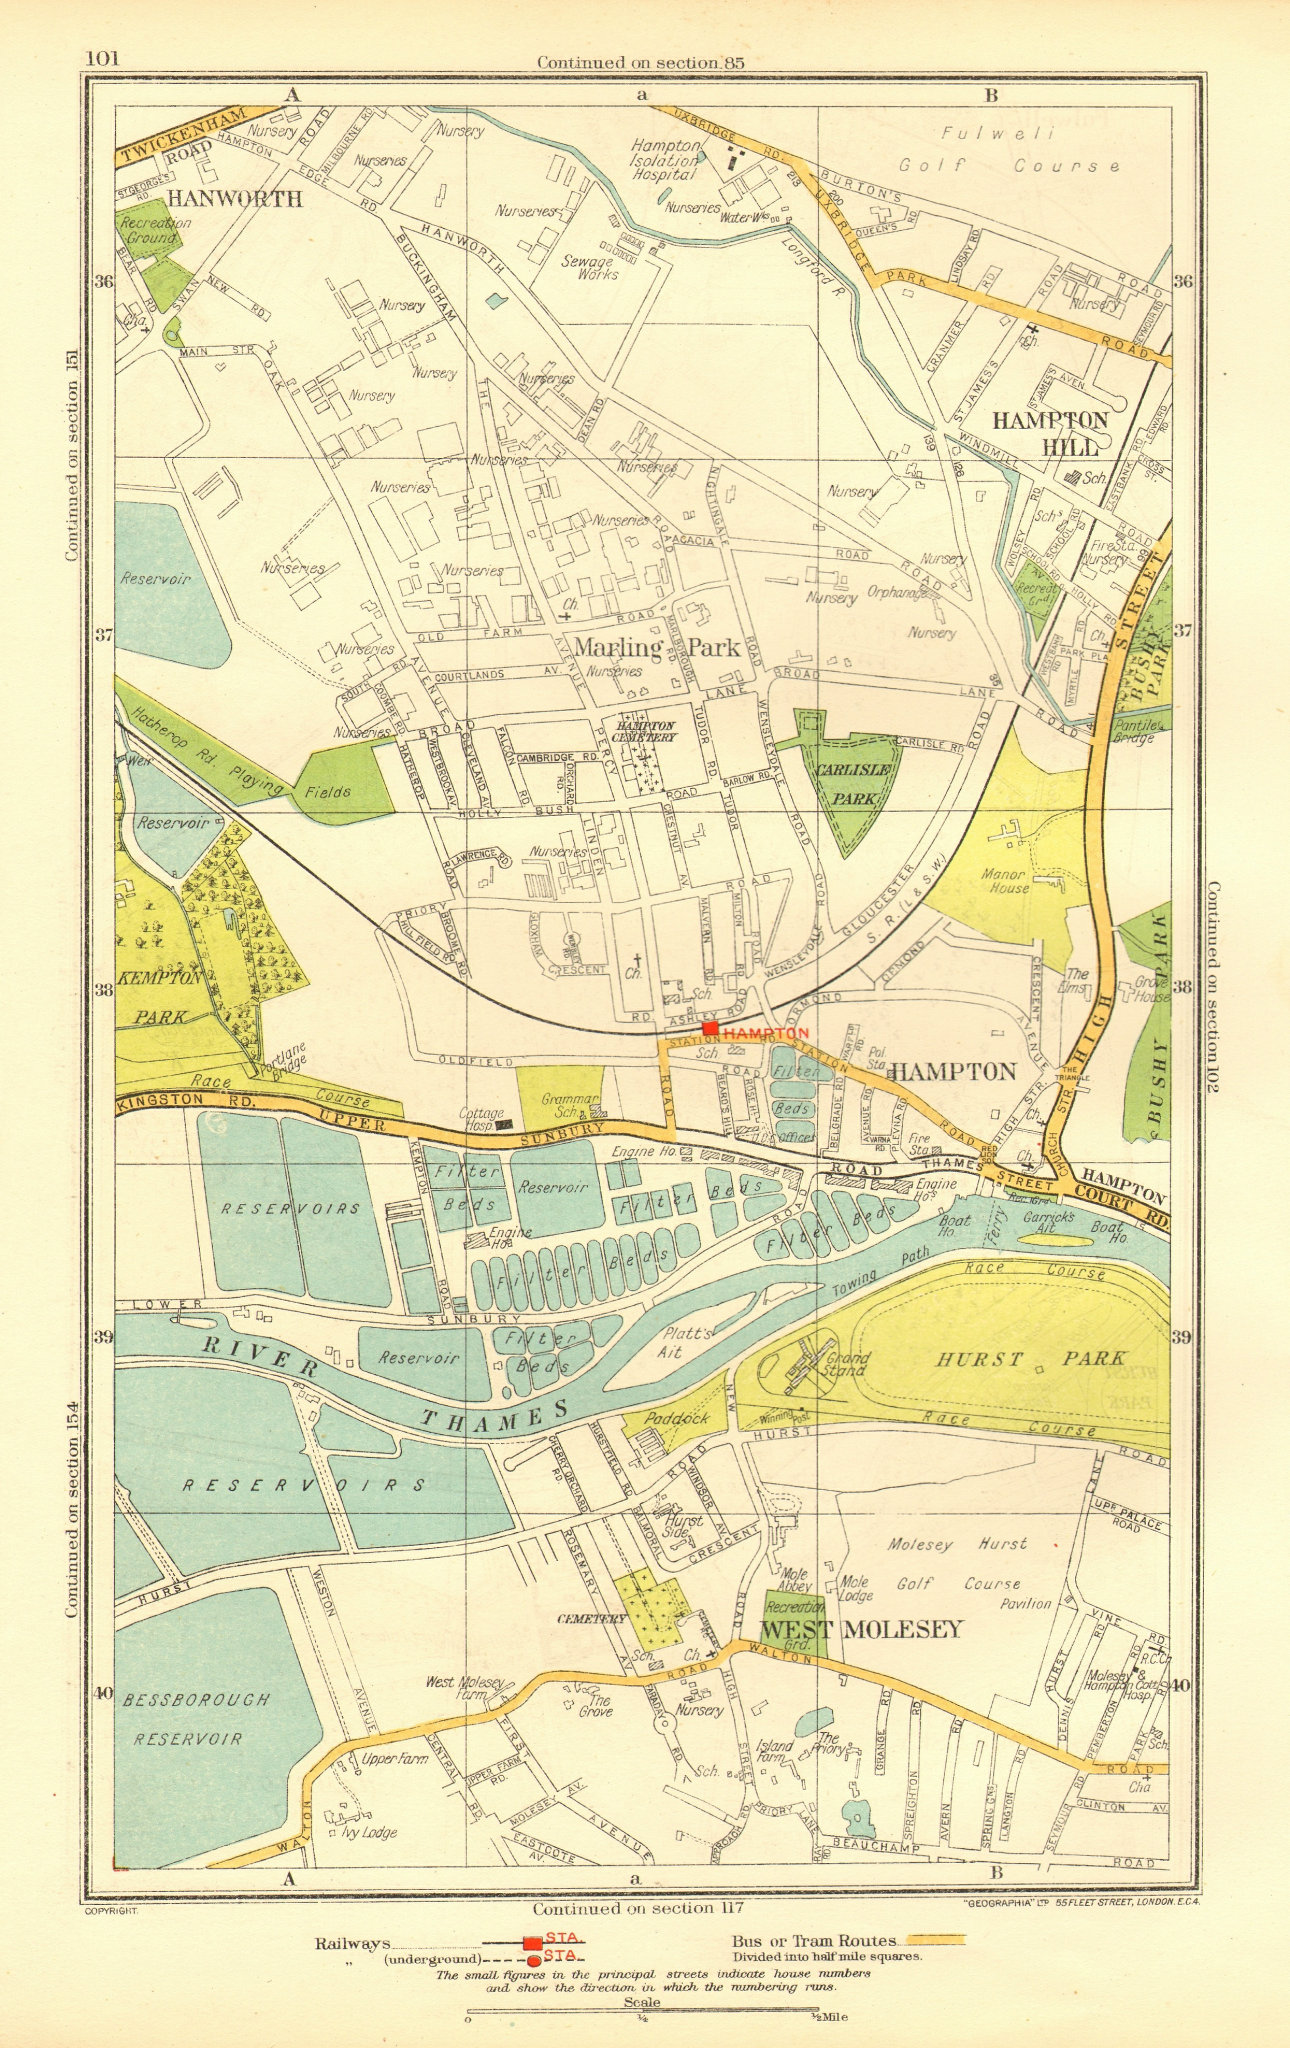 Associate Product HAMPTON. Hampton Hill Marling Park West Molesey Hanworth Hurst Park 1937 map